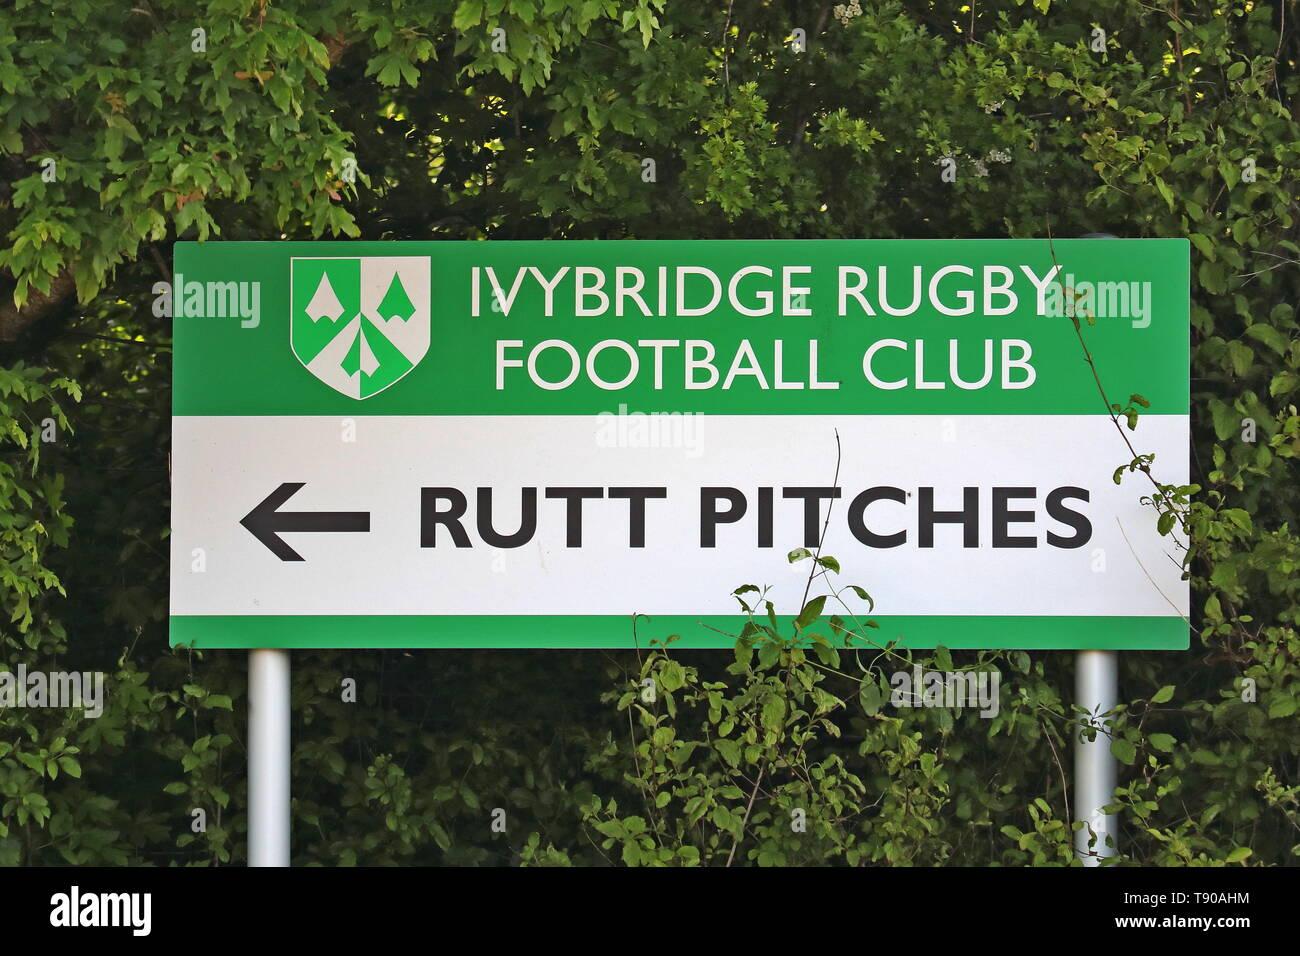 Ivybridge Rugby Club Sign, Rutt Pitches, Devon Stock Photo